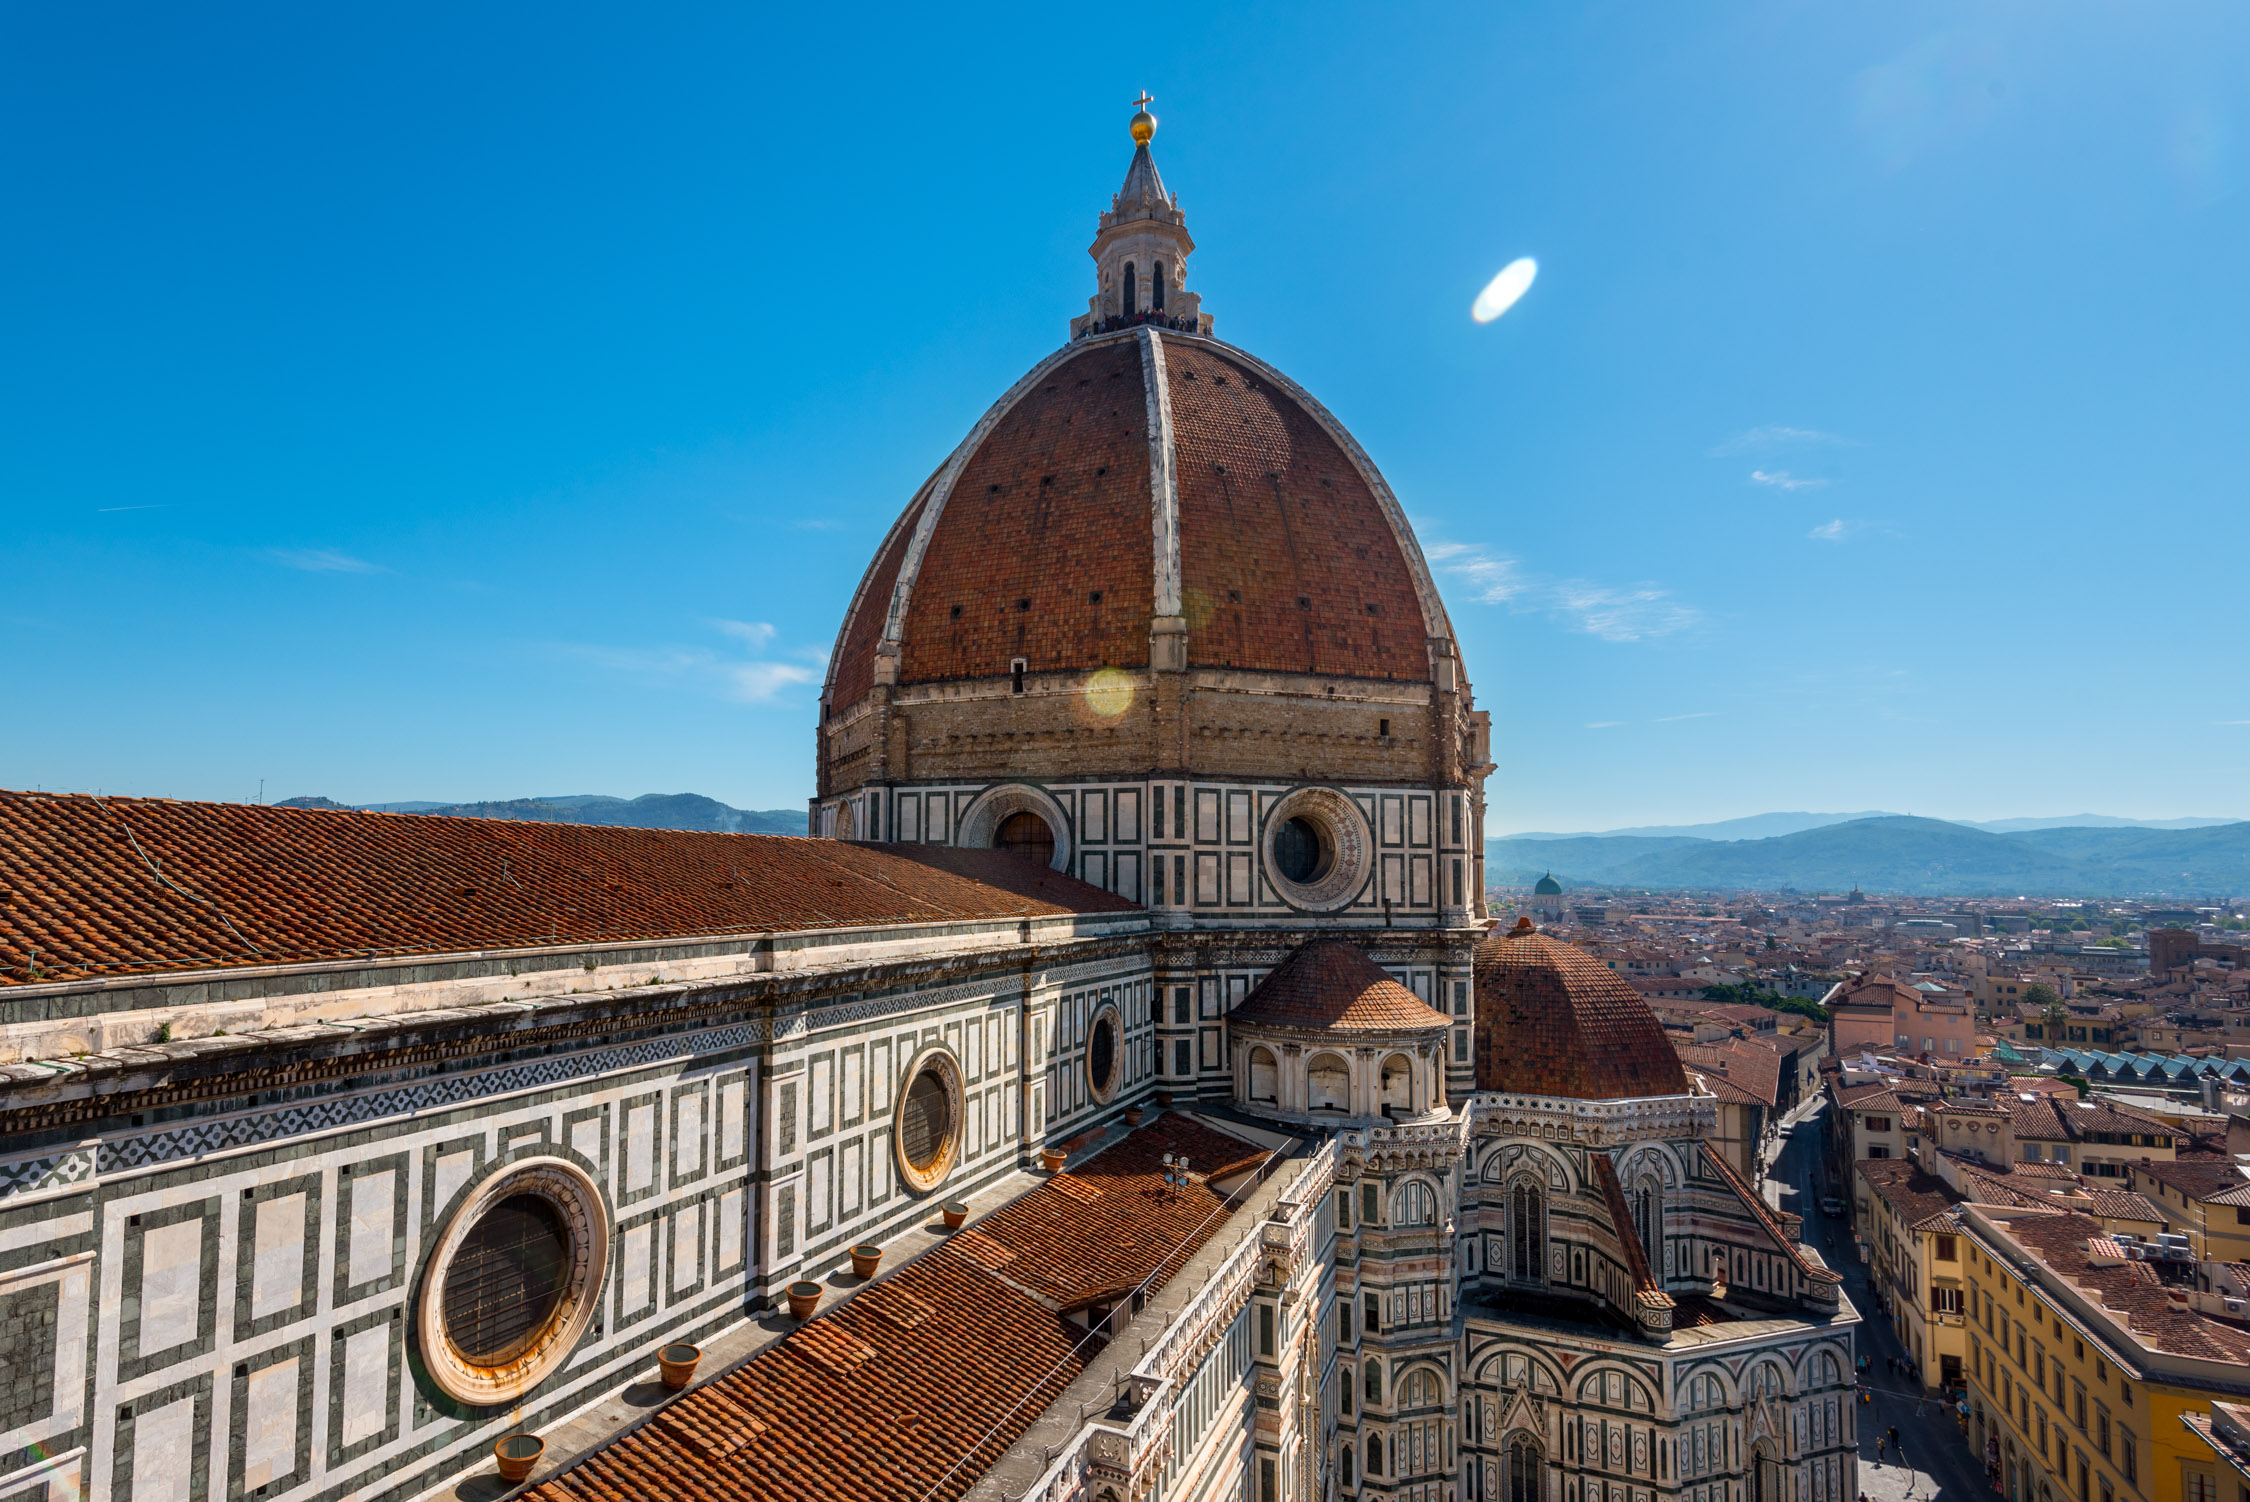 Our views from the top of the Basilica of Santa Maria Novella